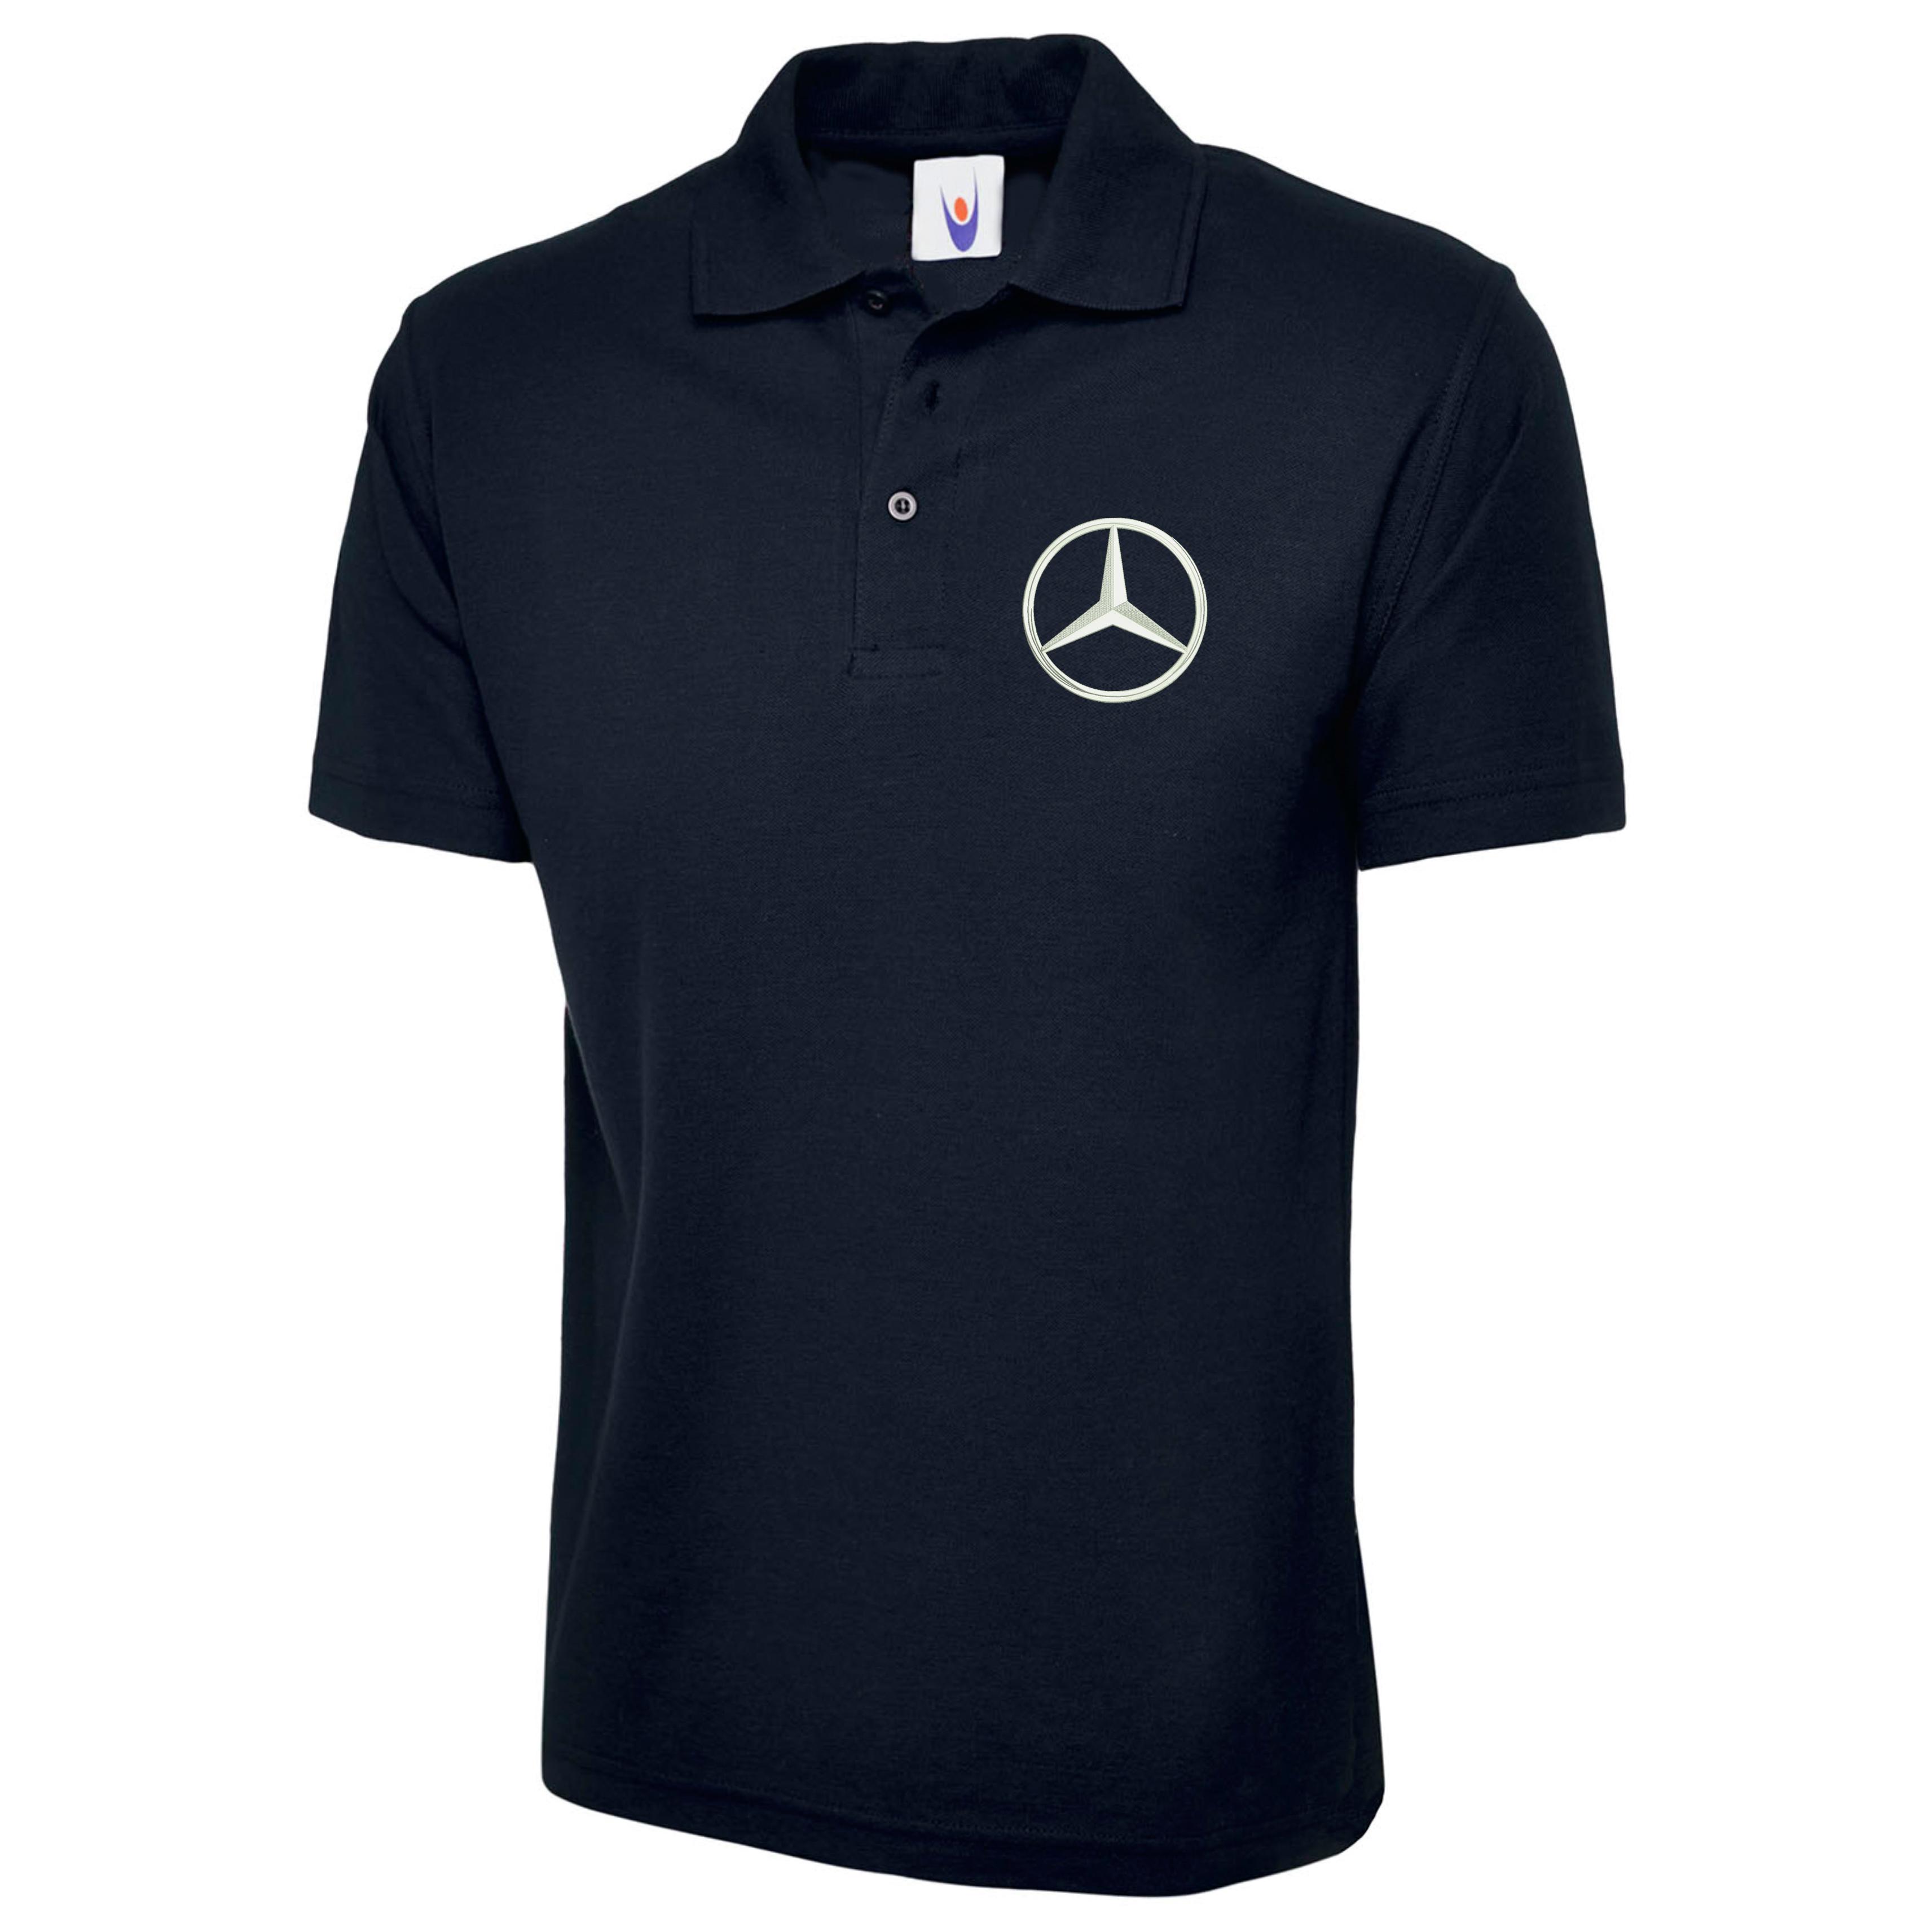 polo ferraristore fans benz young prancinghorse pin kids redmaranello s mercedes shirt shirts kid racing rossoferrari ferrari cavallinorampante